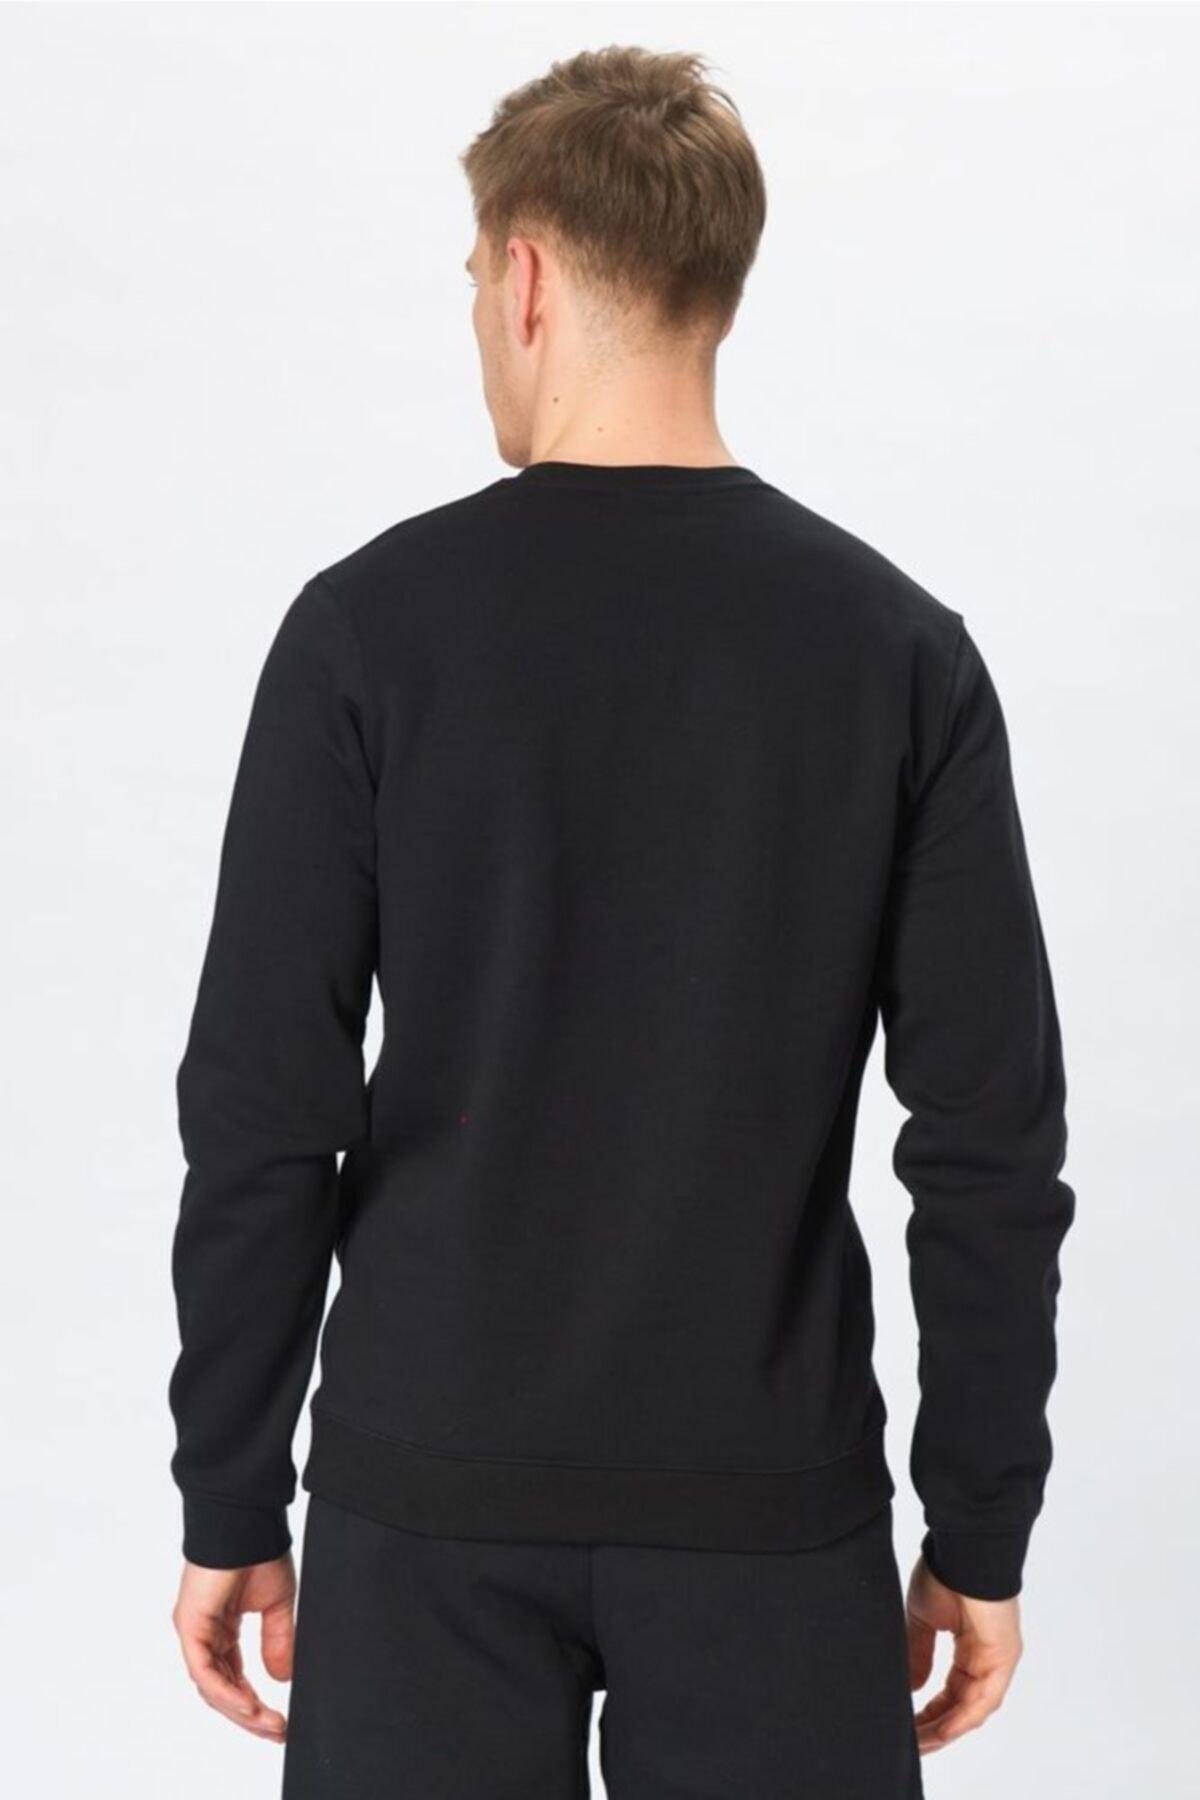 Nike Erkek Siyah Sweatshirt - M Crw Flc Tm Club19 - AJ1466-010 2